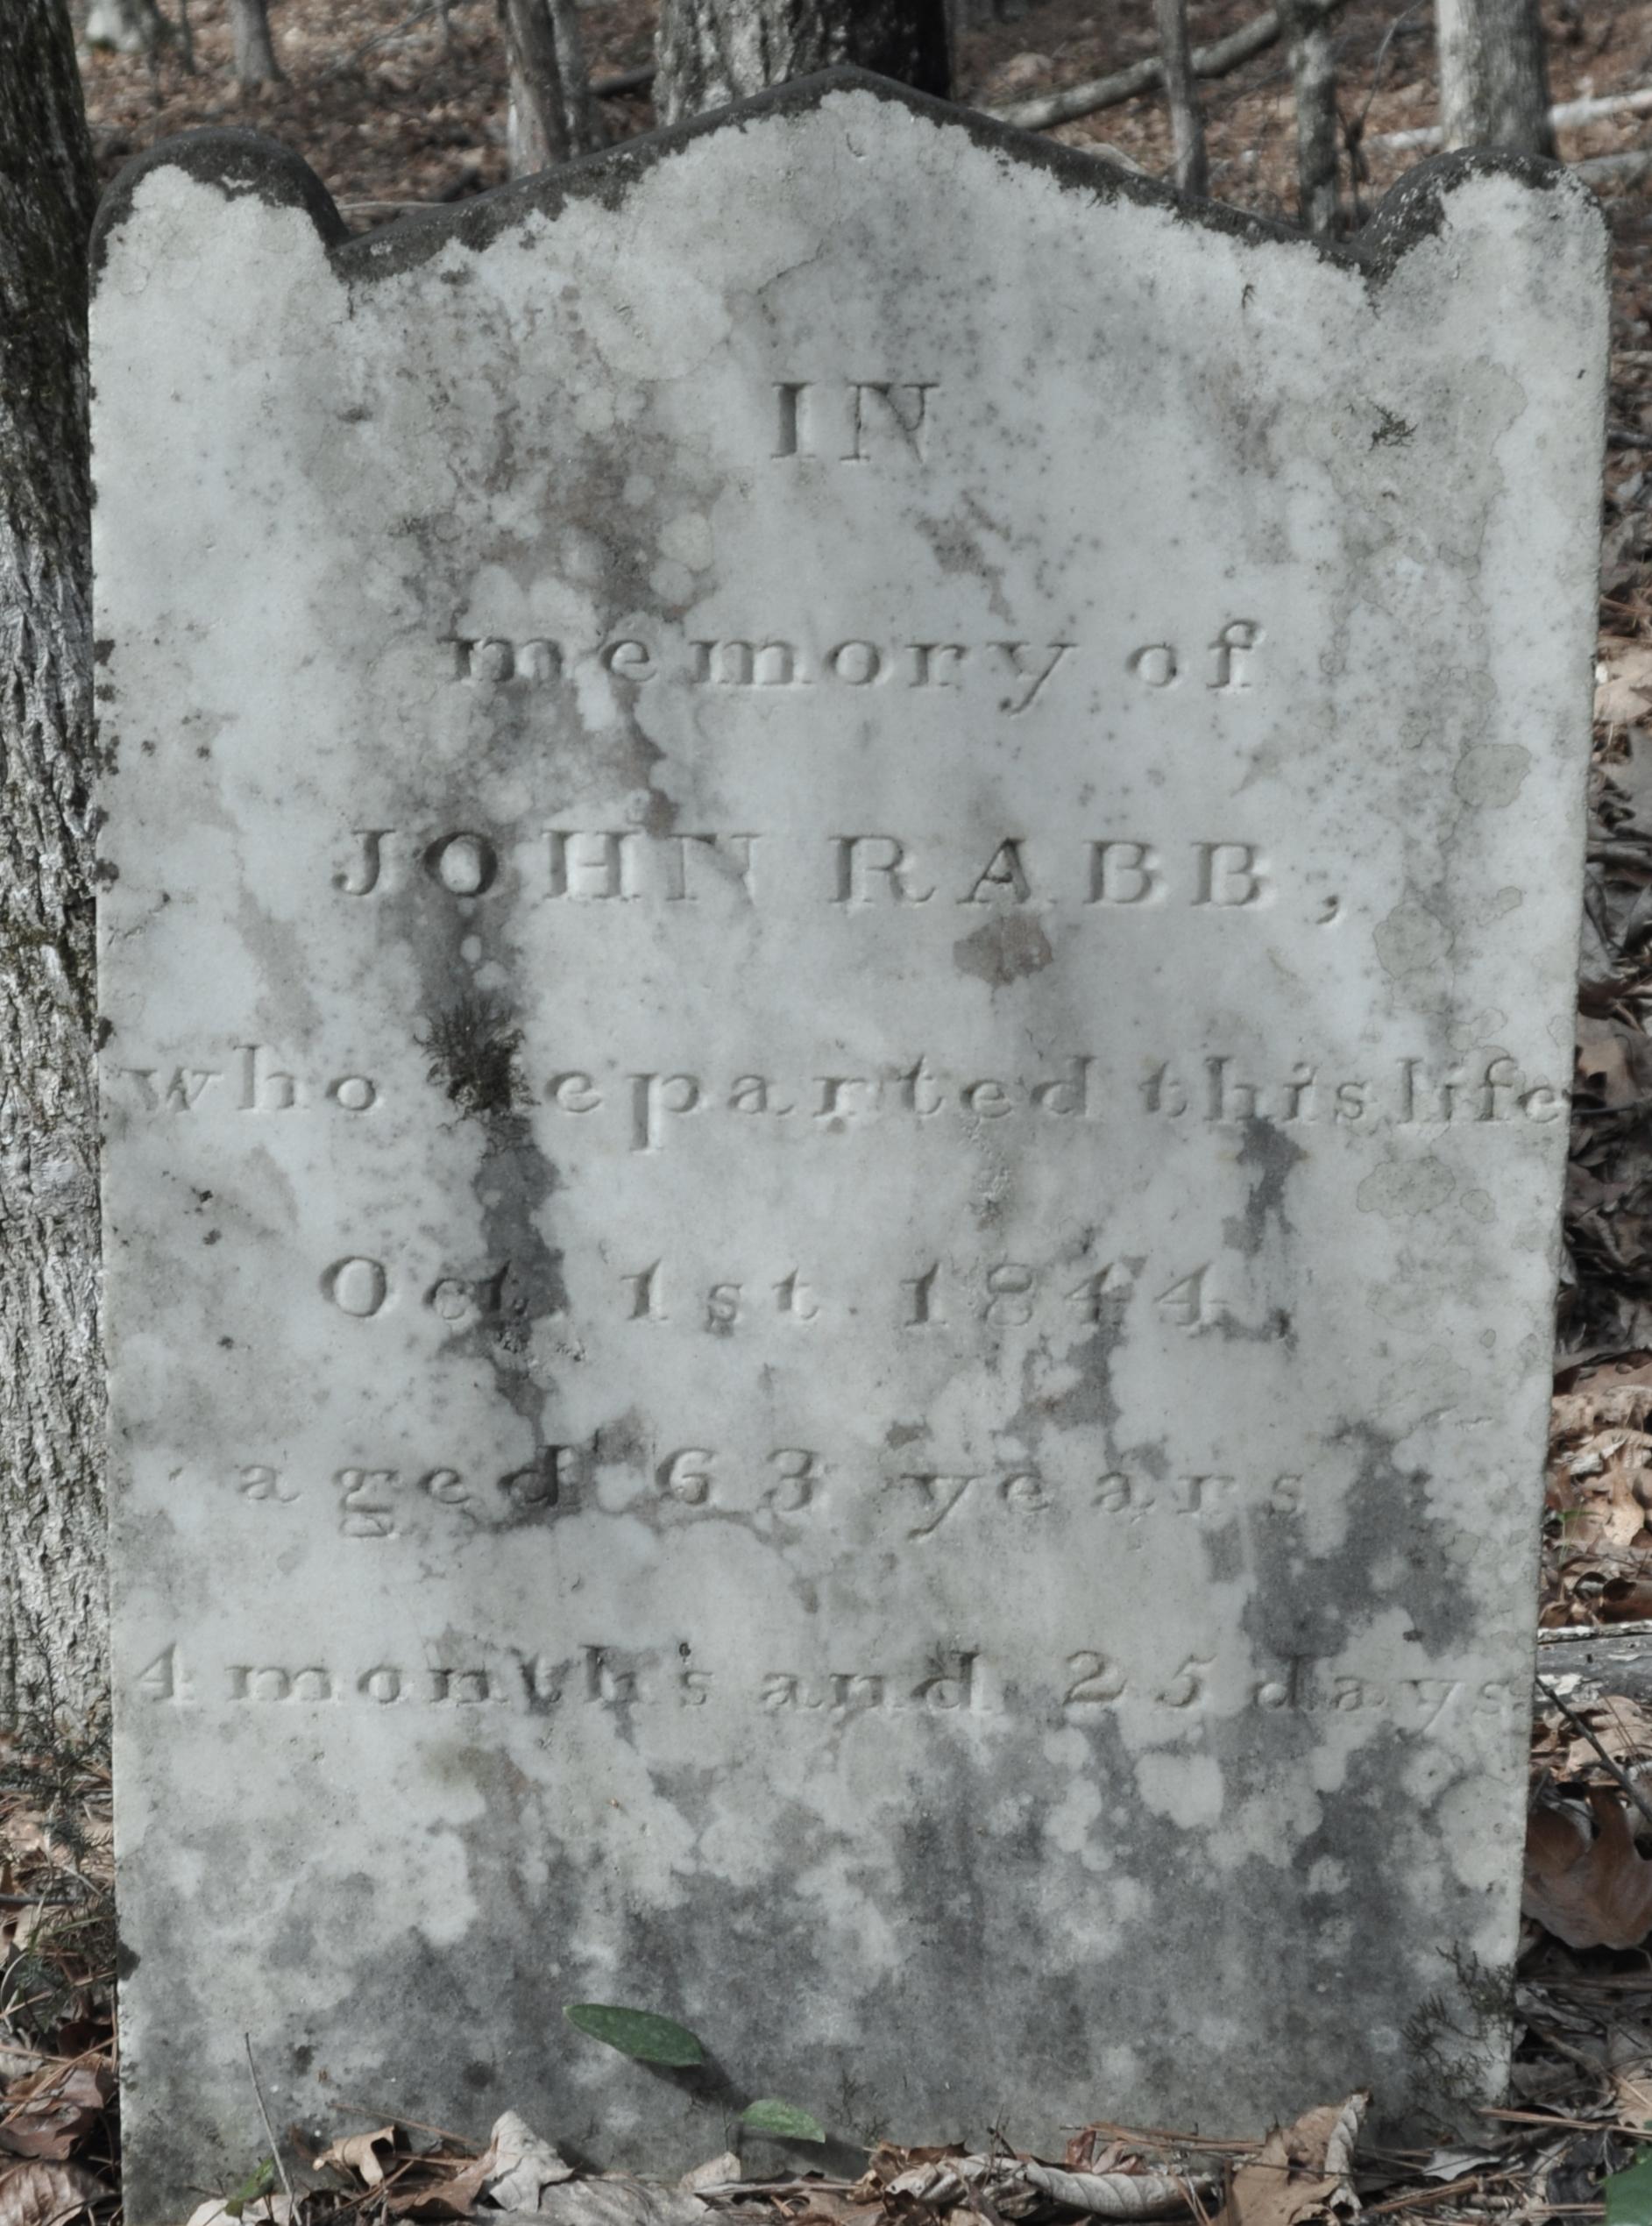 John Rabb